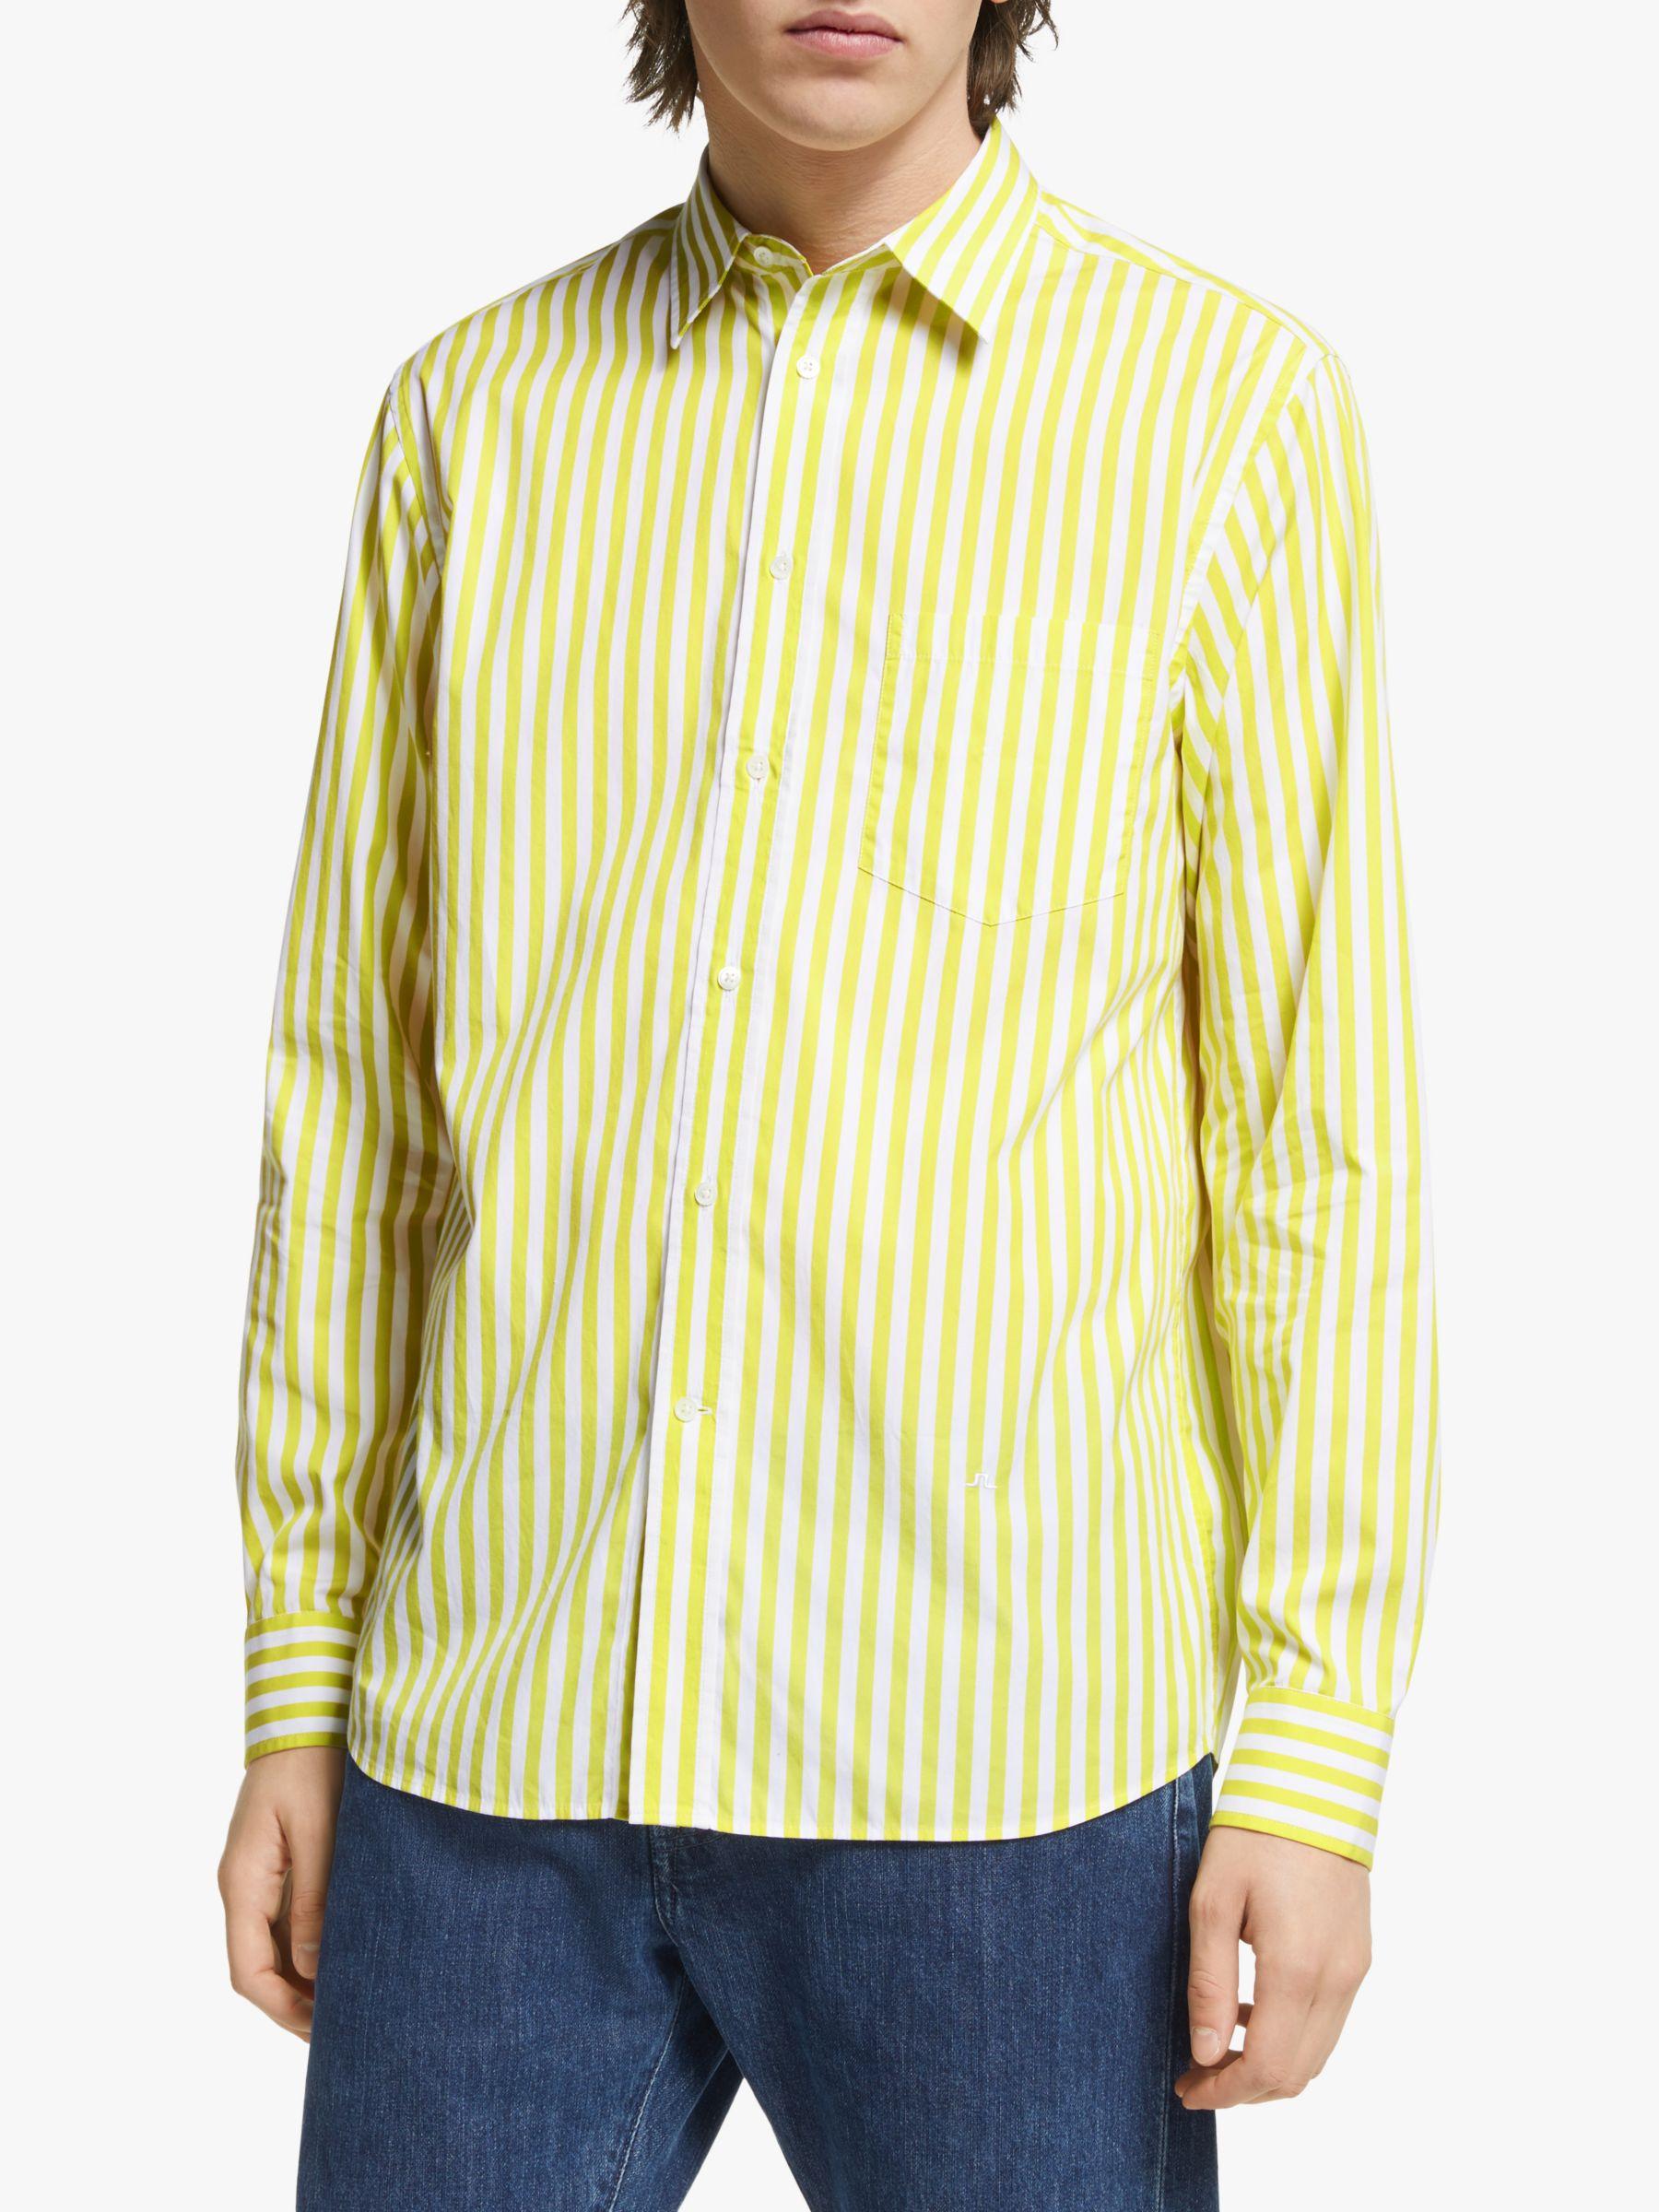 J.LINDEBERG J.Lindeberg Daniel Striped Cotton Shirt, Acid Dreams